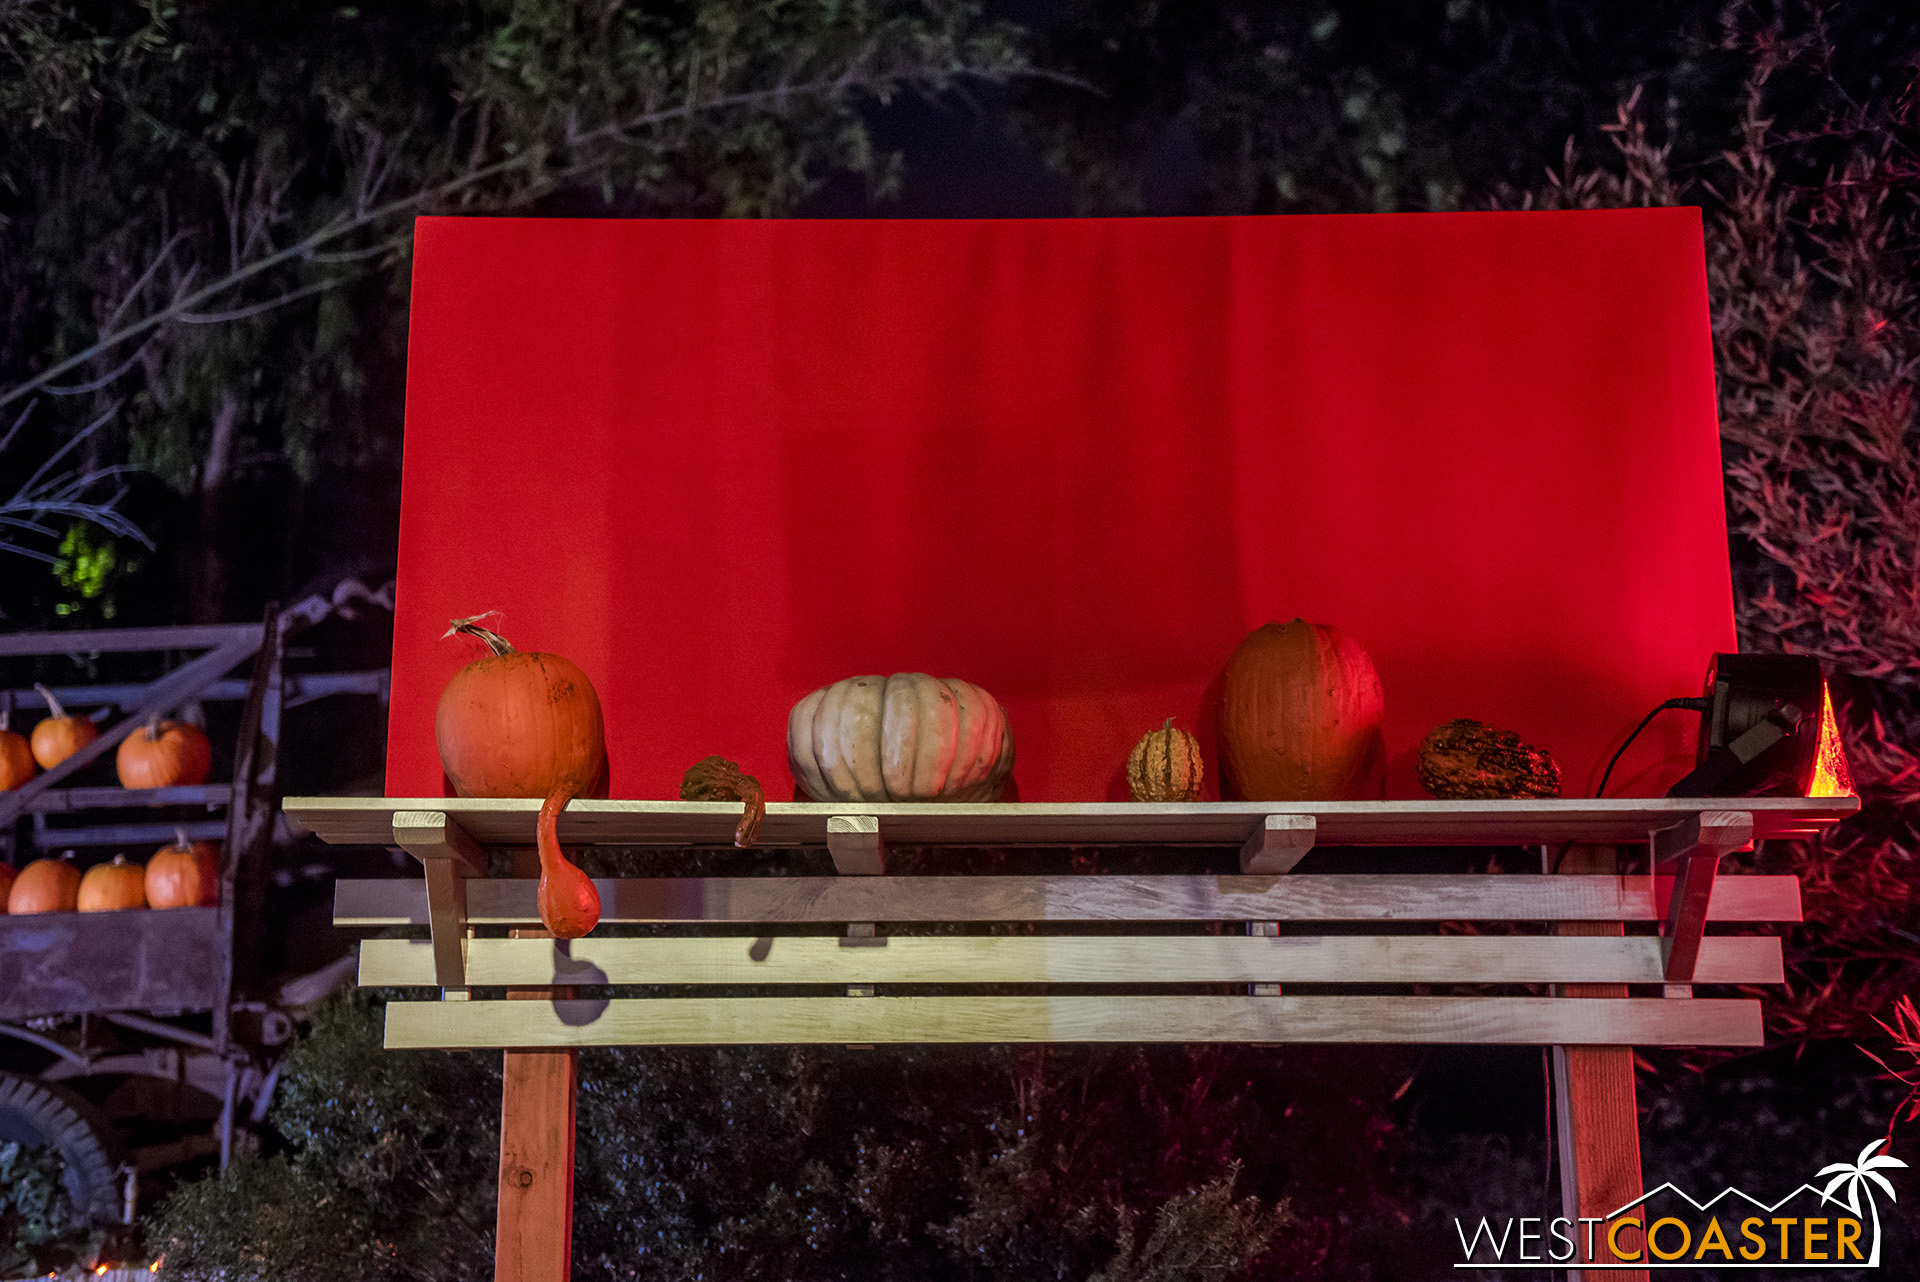 Pumpkins and a blank, orange billboard.